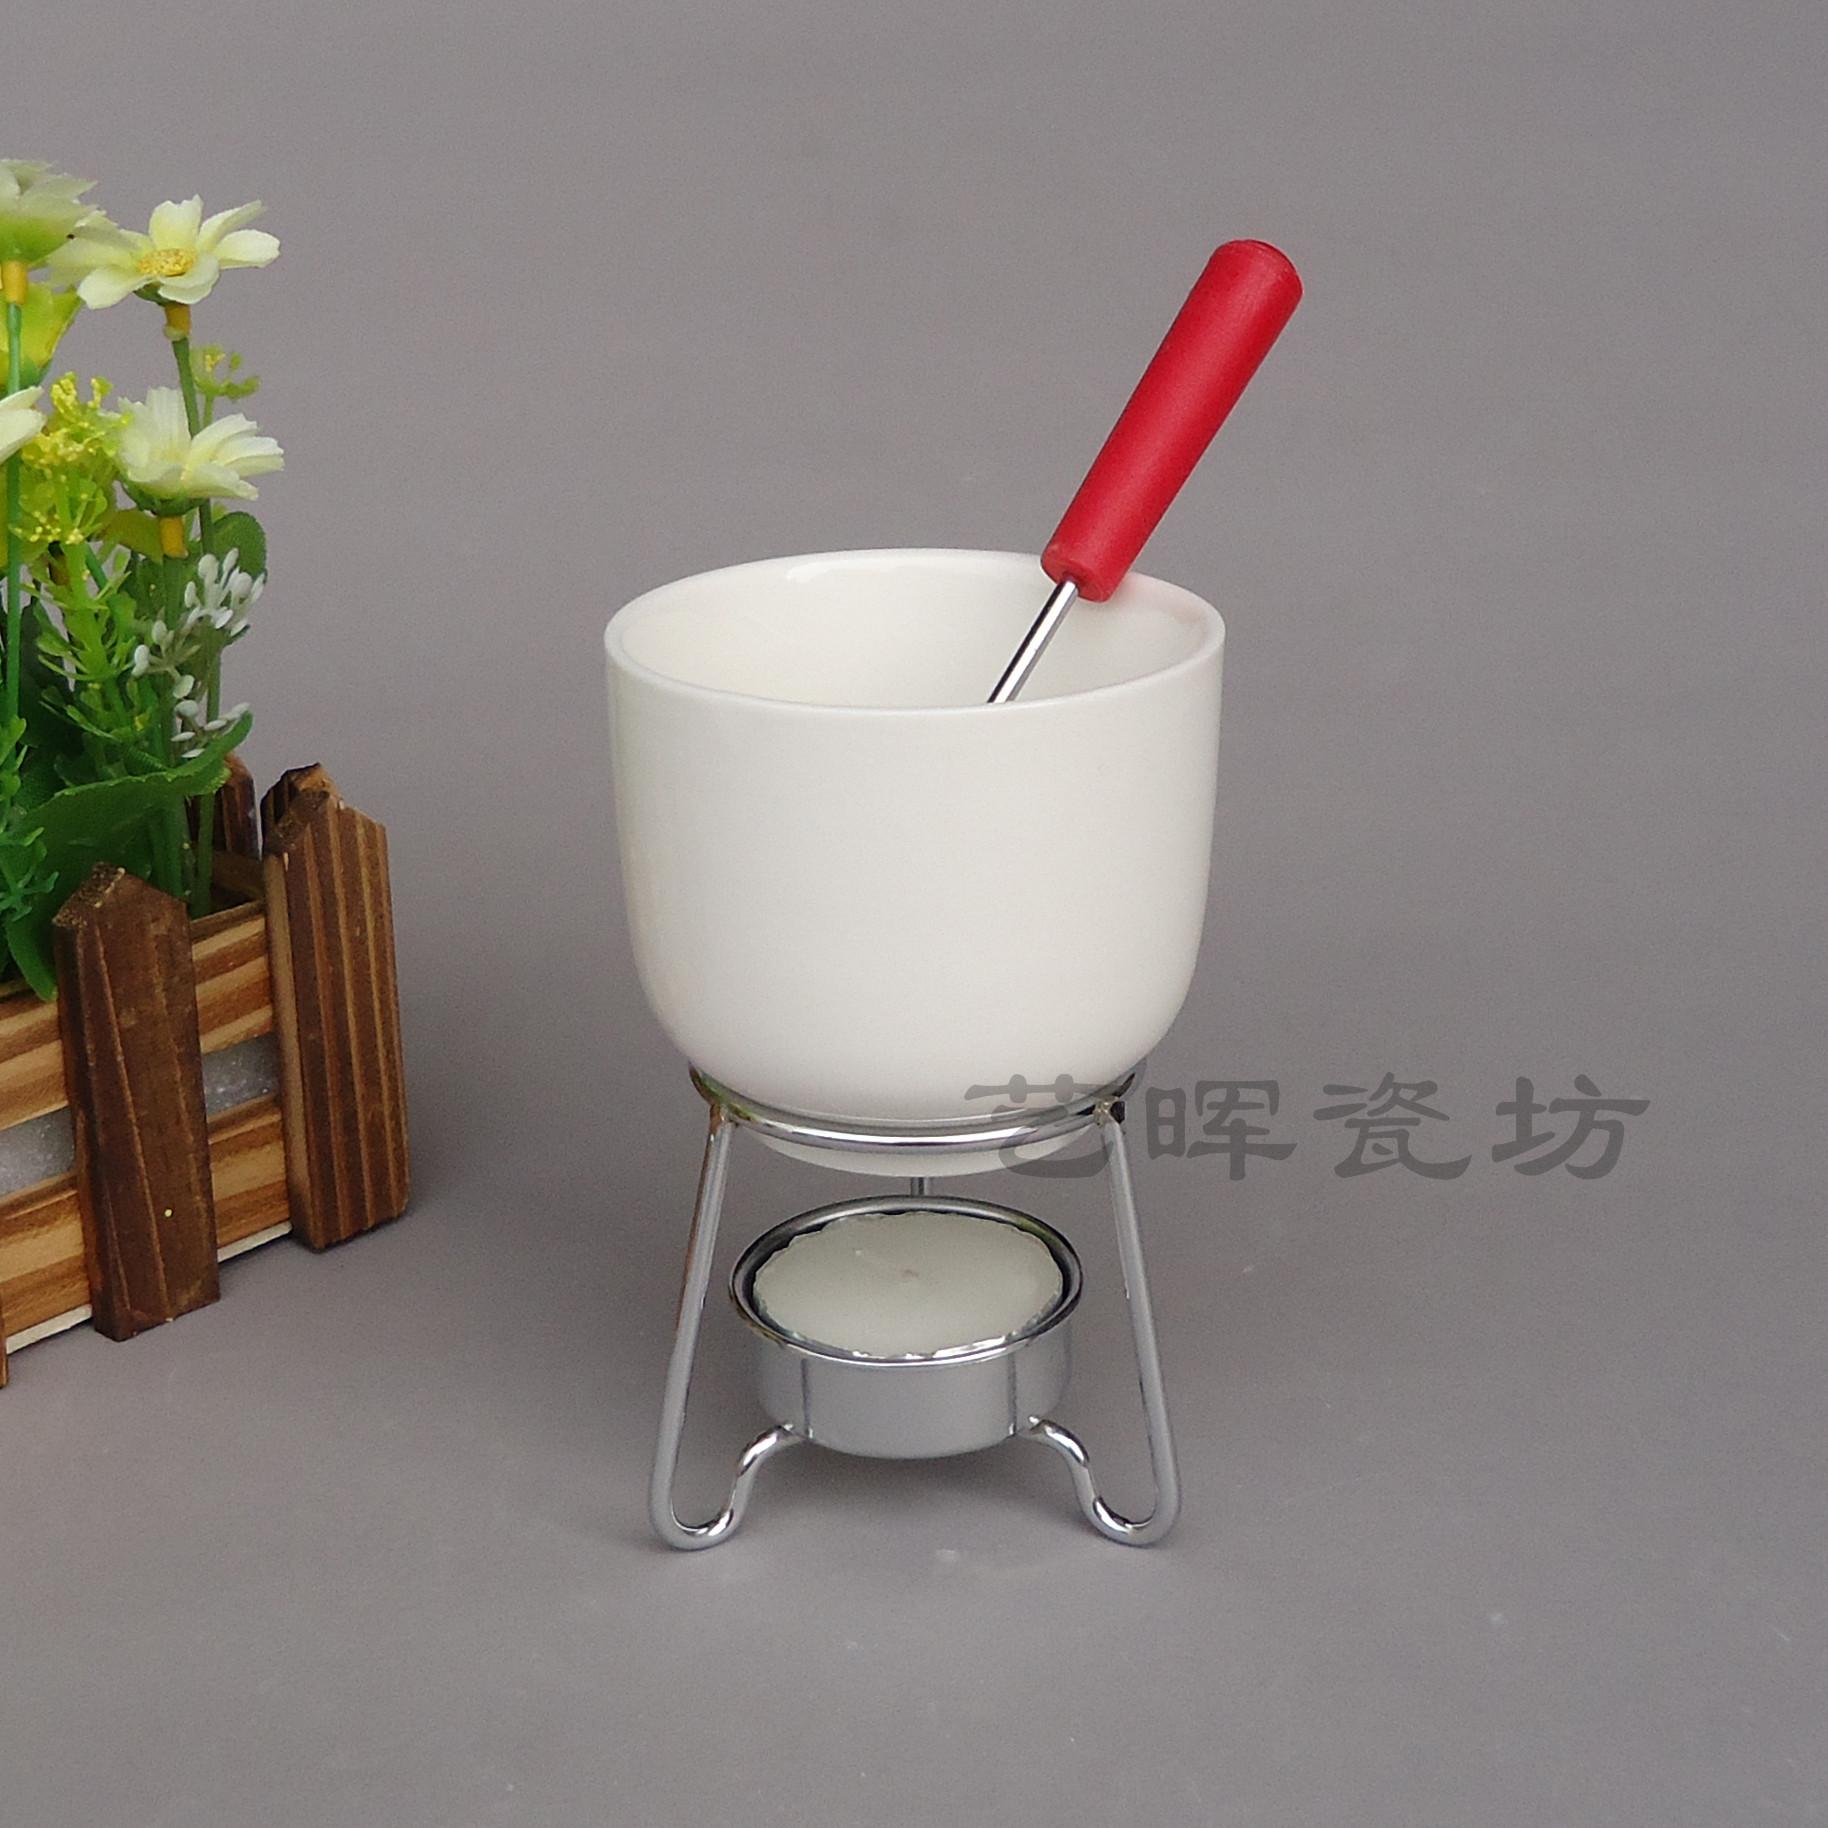 Melting Chocolate Pots